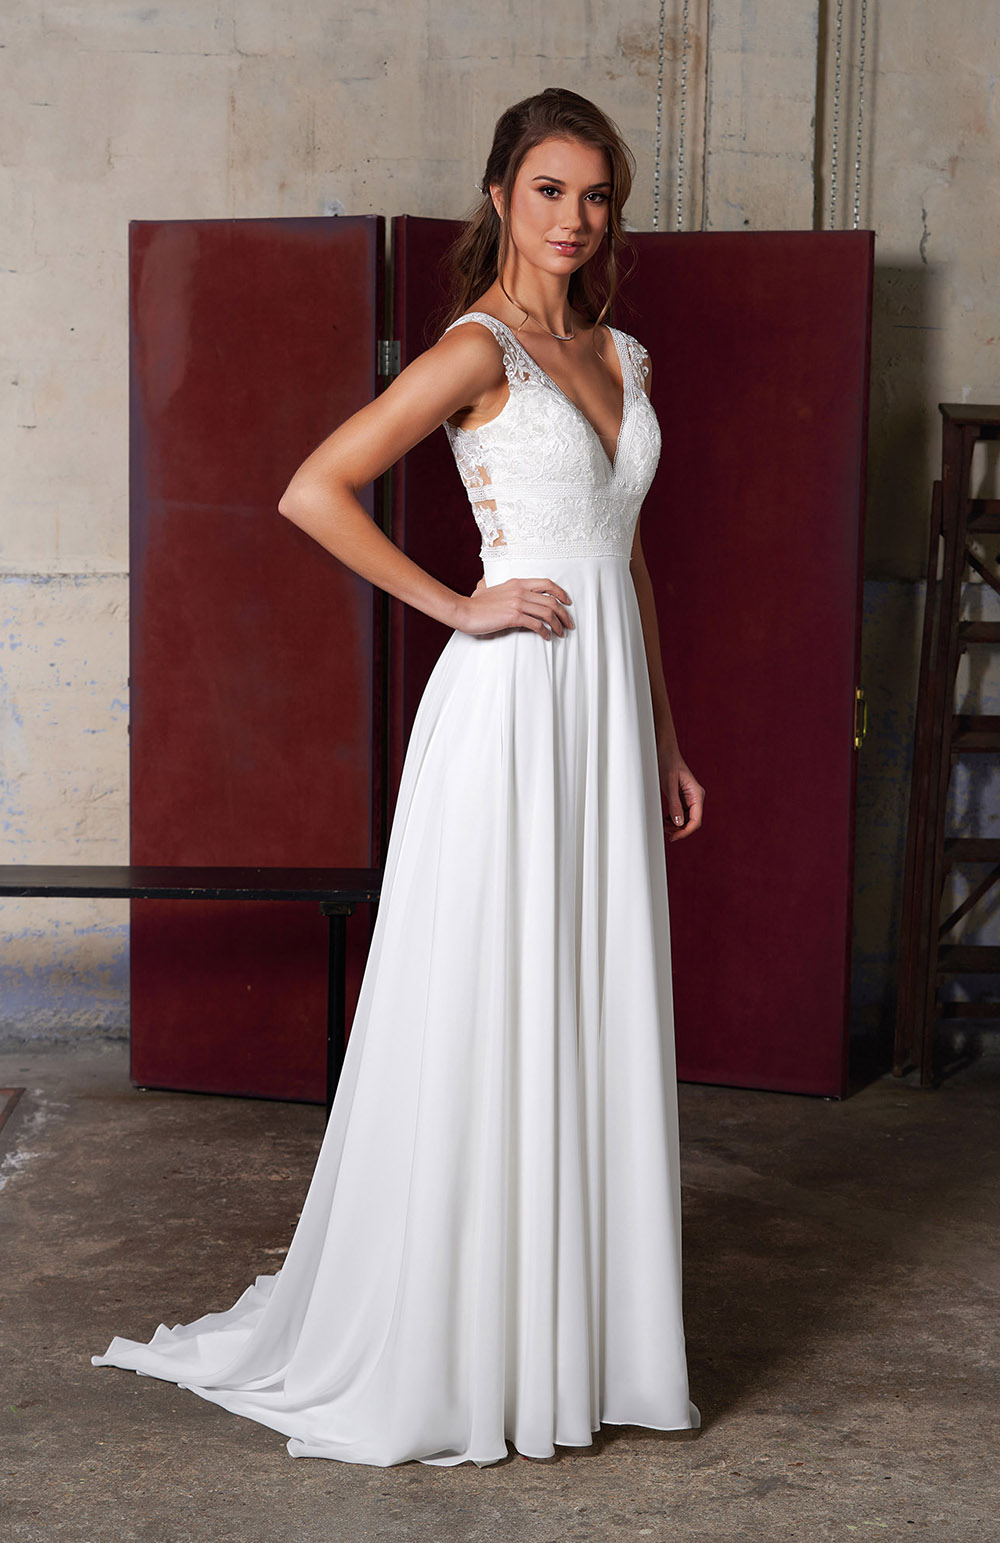 Robe de mariée Modèle Joa